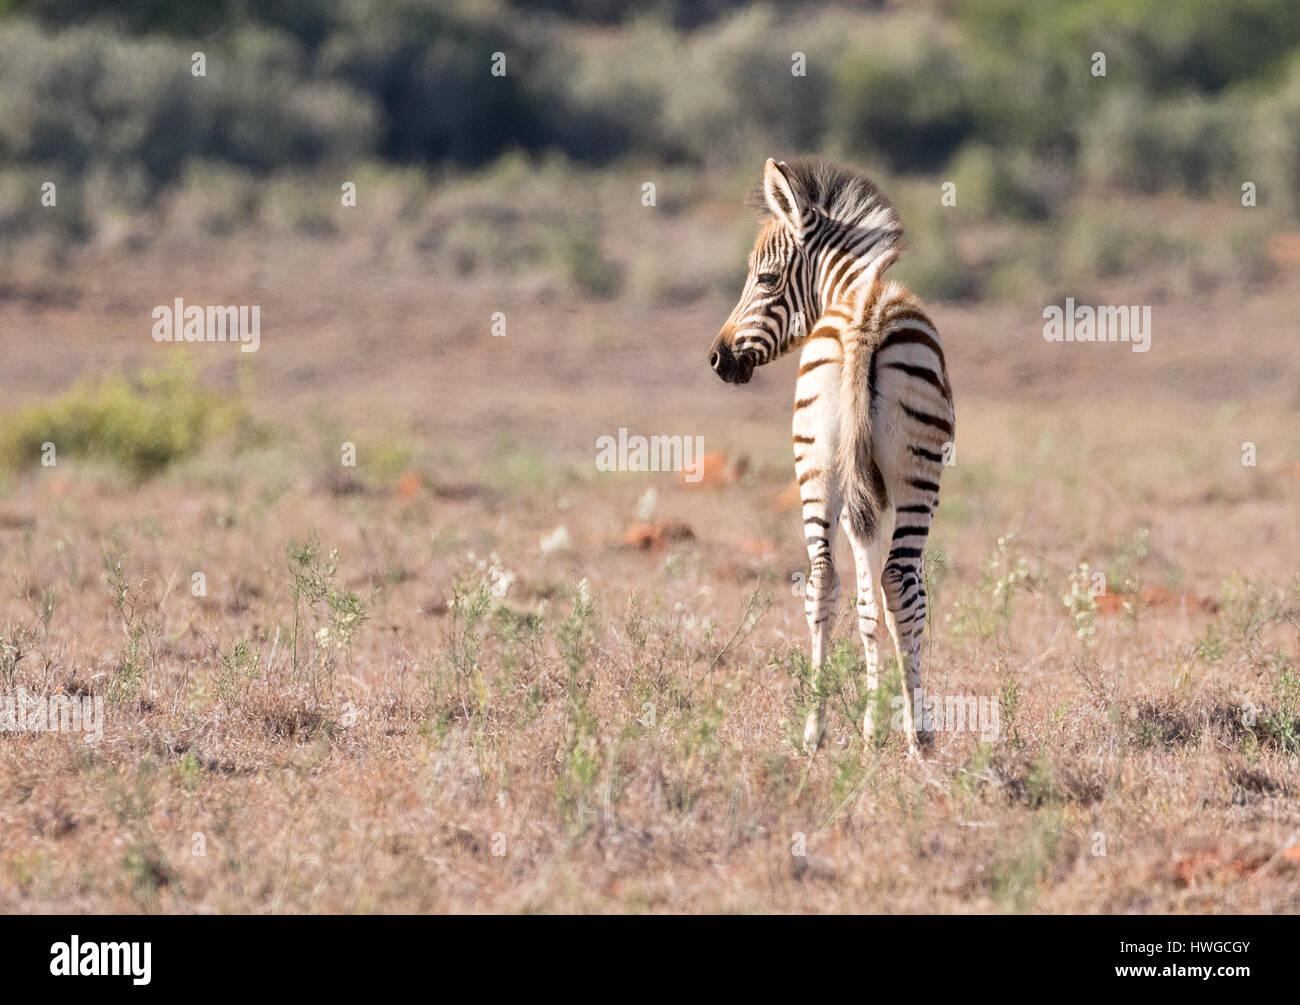 Zebra foal, baby zebra 3 days old, wild, Equus Quagga, South Africa - Stock Image